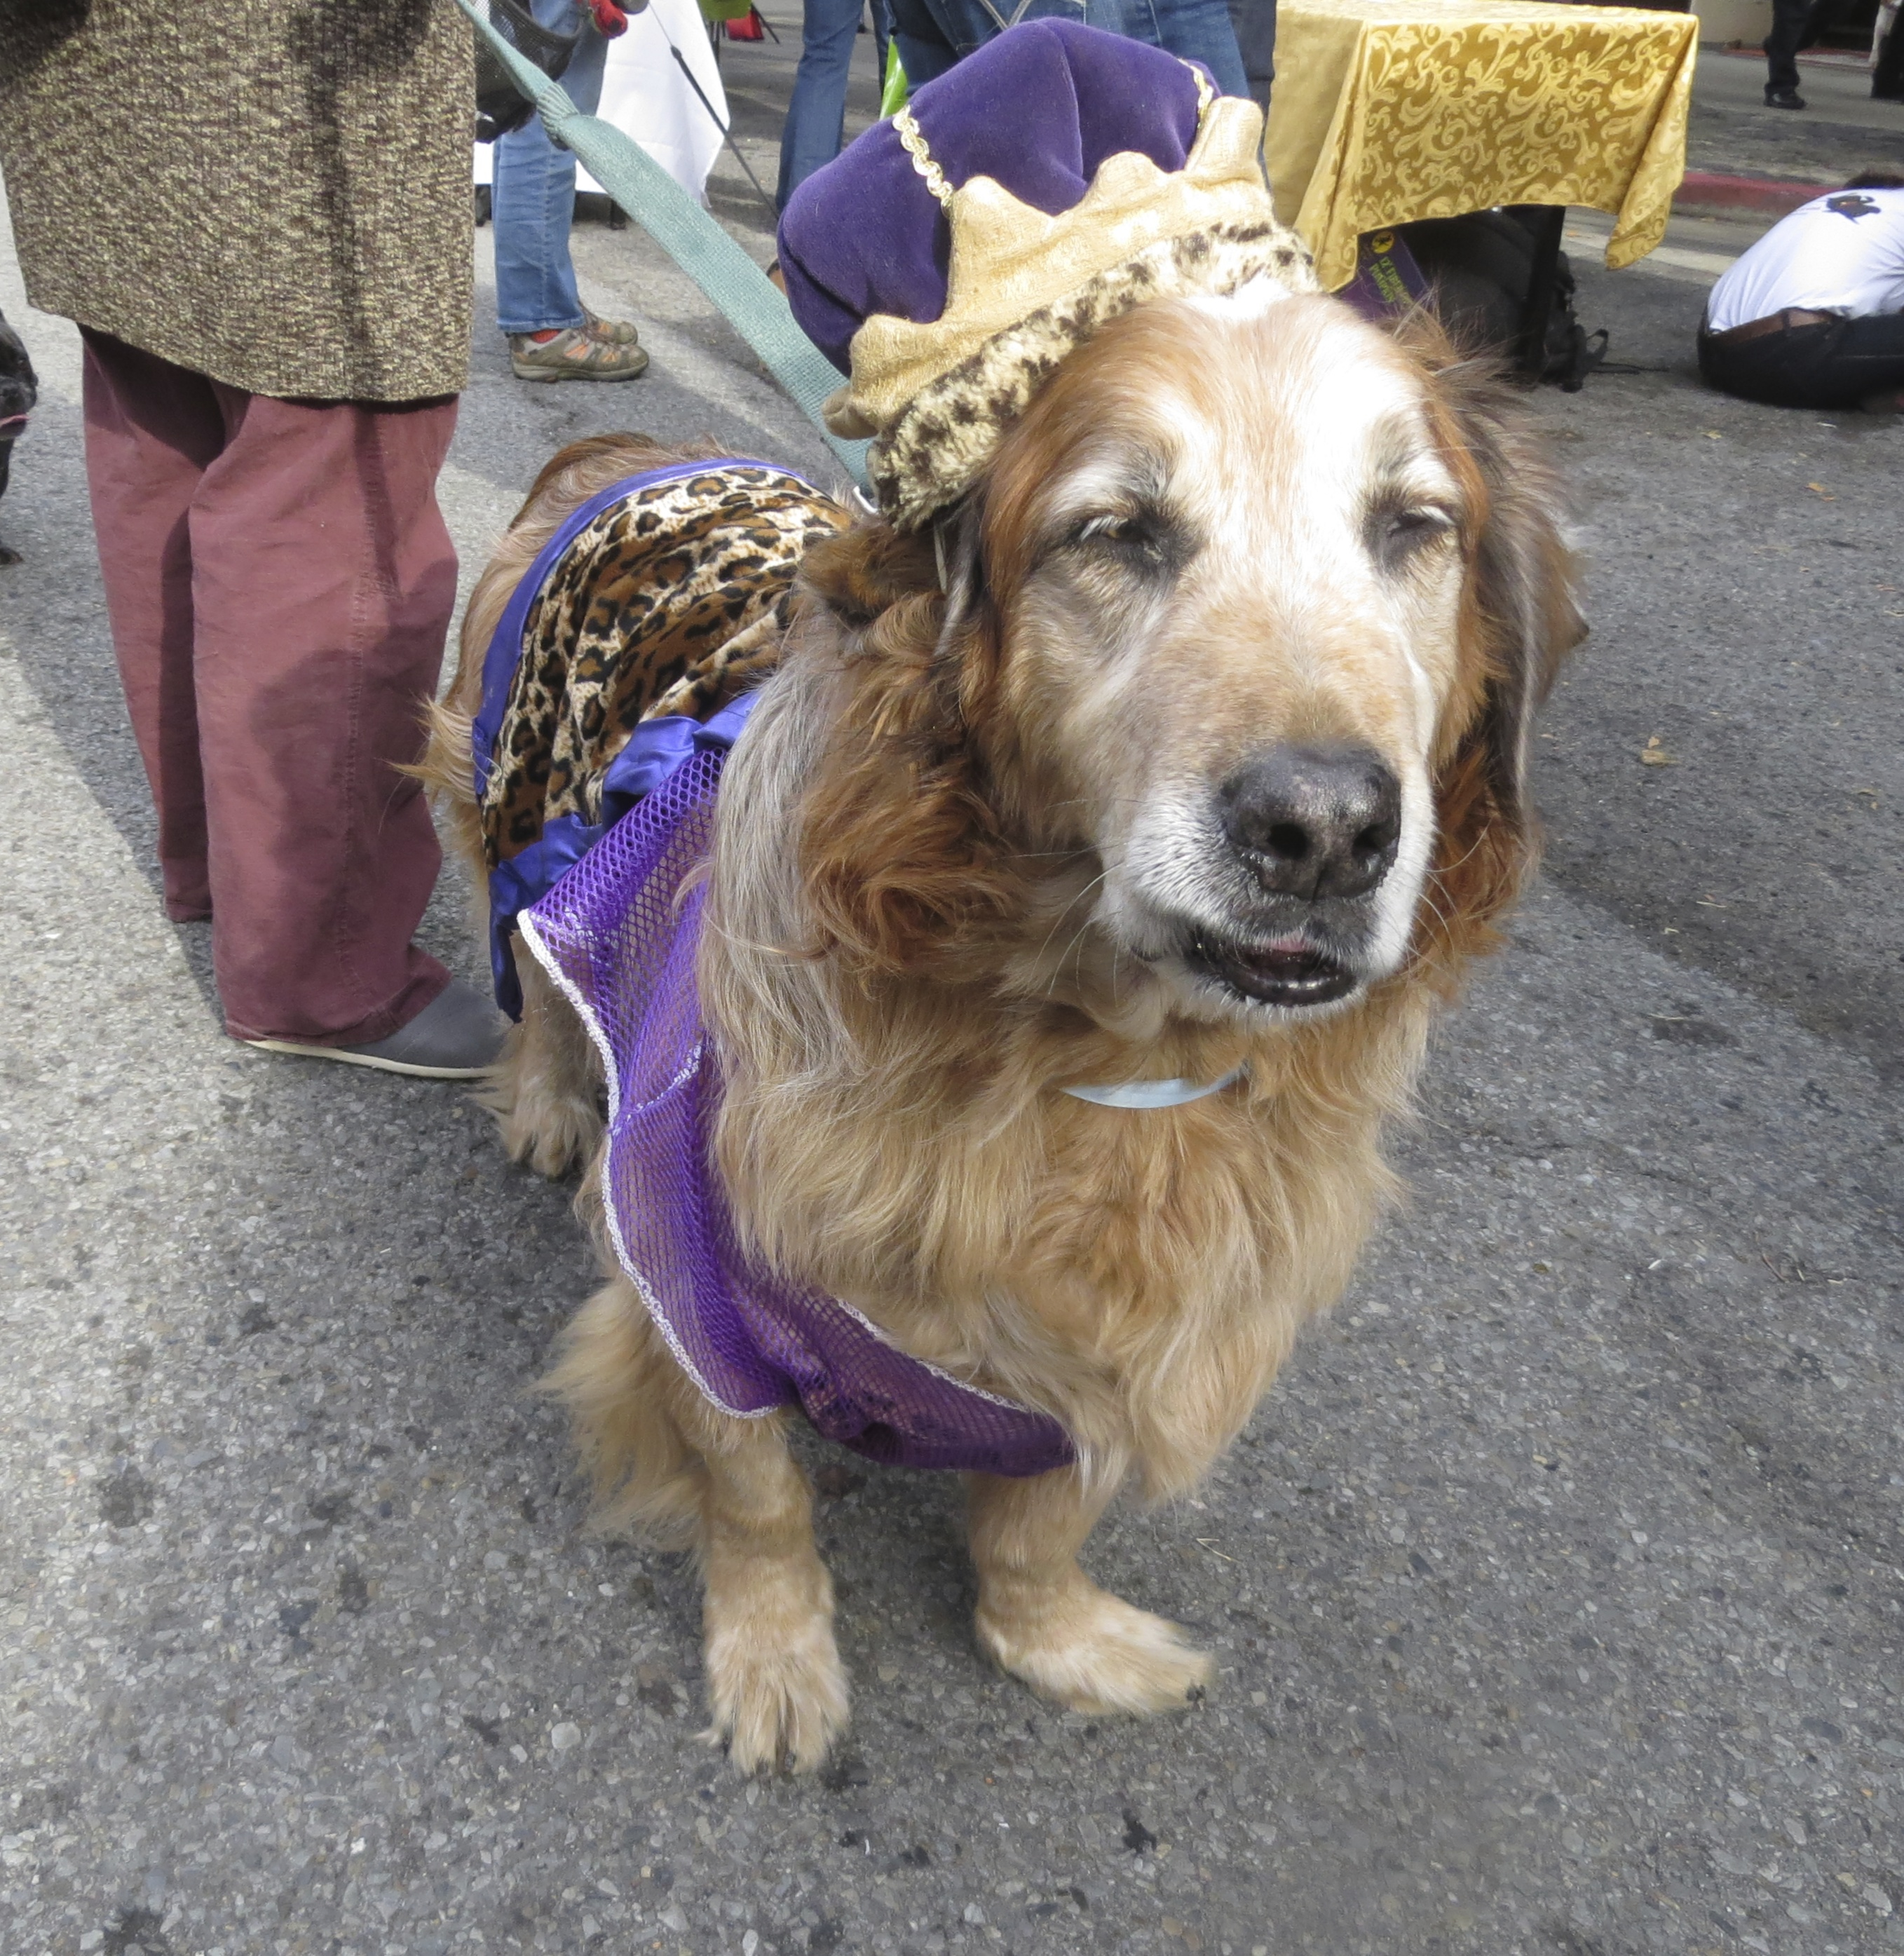 Basset Hound/Australian Shepherd/Golden Retriever in a King Costume